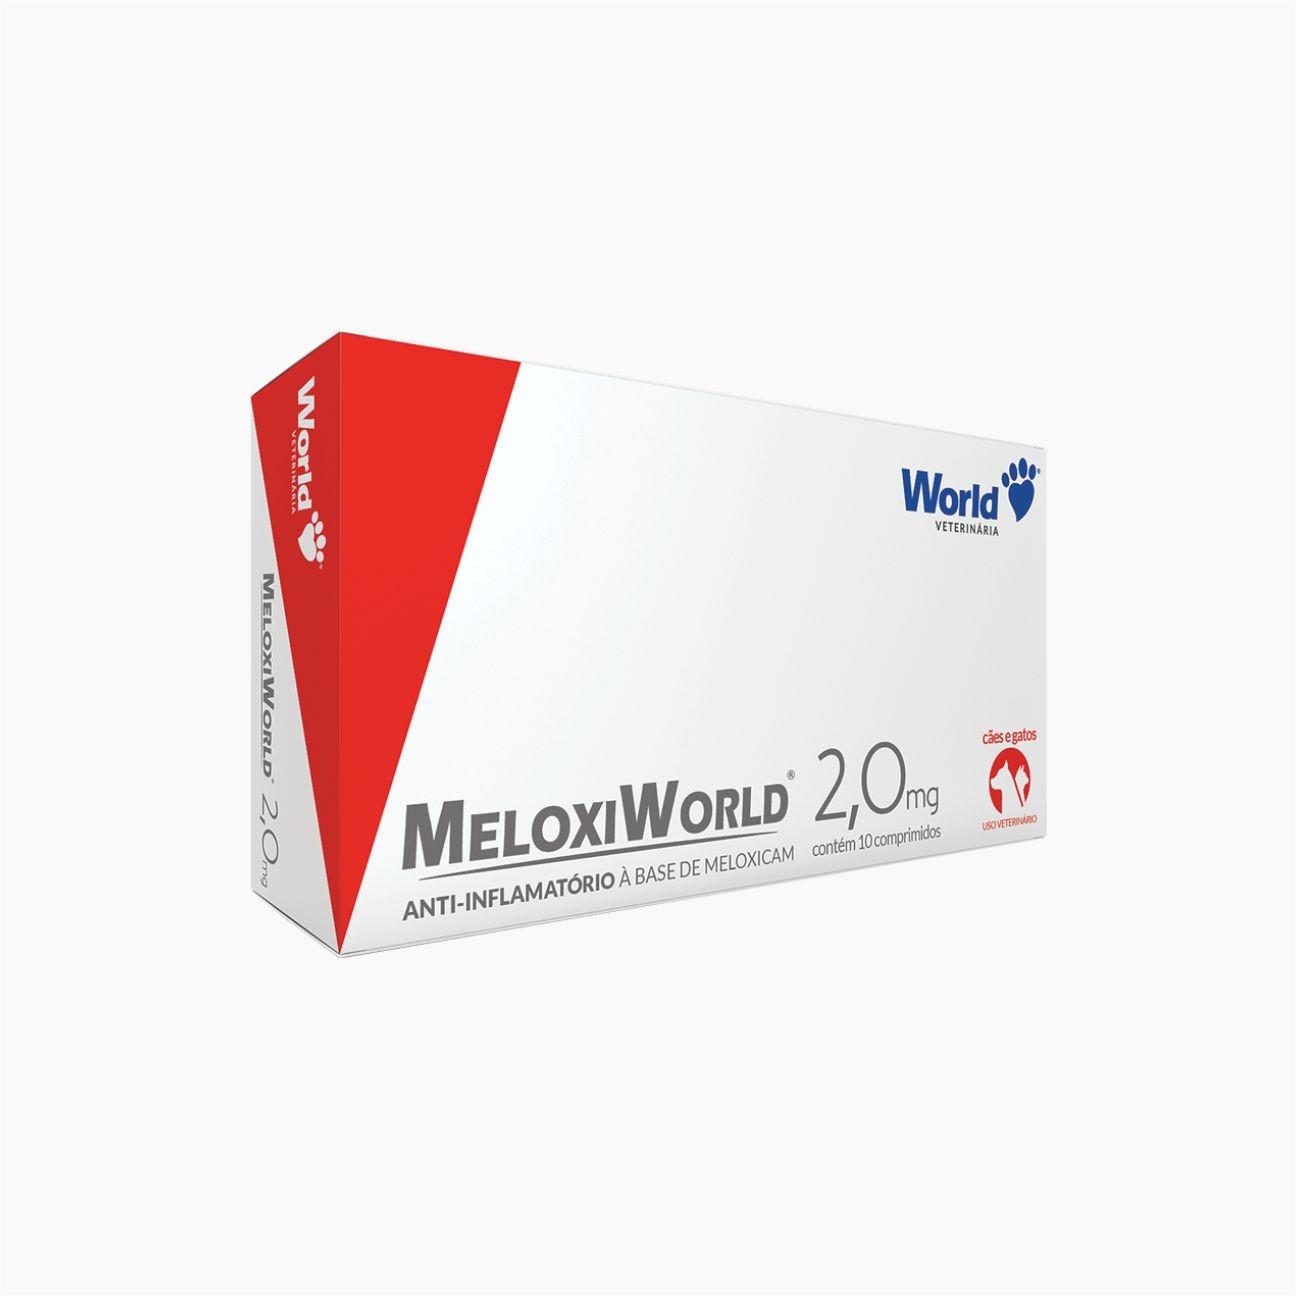 MELOXIWORLD 2,0MG C/ 10 COMPRIMIDOS